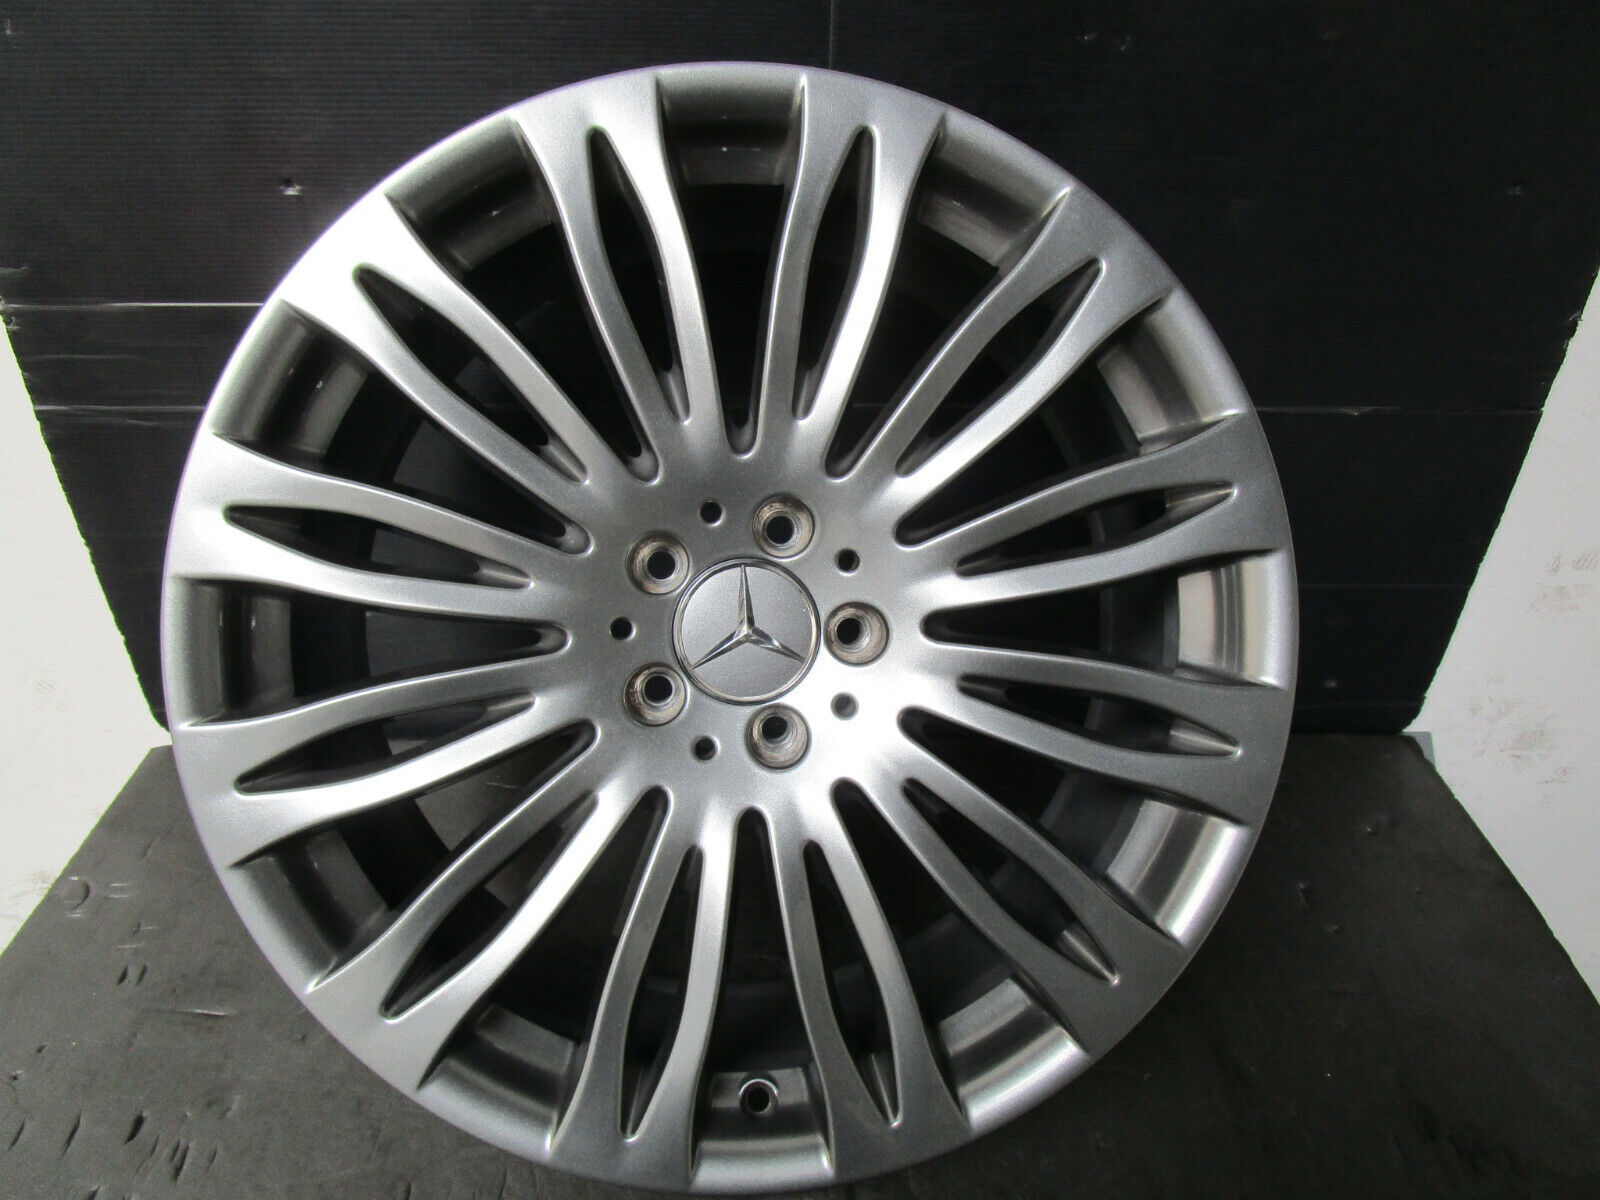 1x Original Mercedes S-Klasse W 222 Alufelge 8, 5J x 20 ET 36 A2224011702 Z253